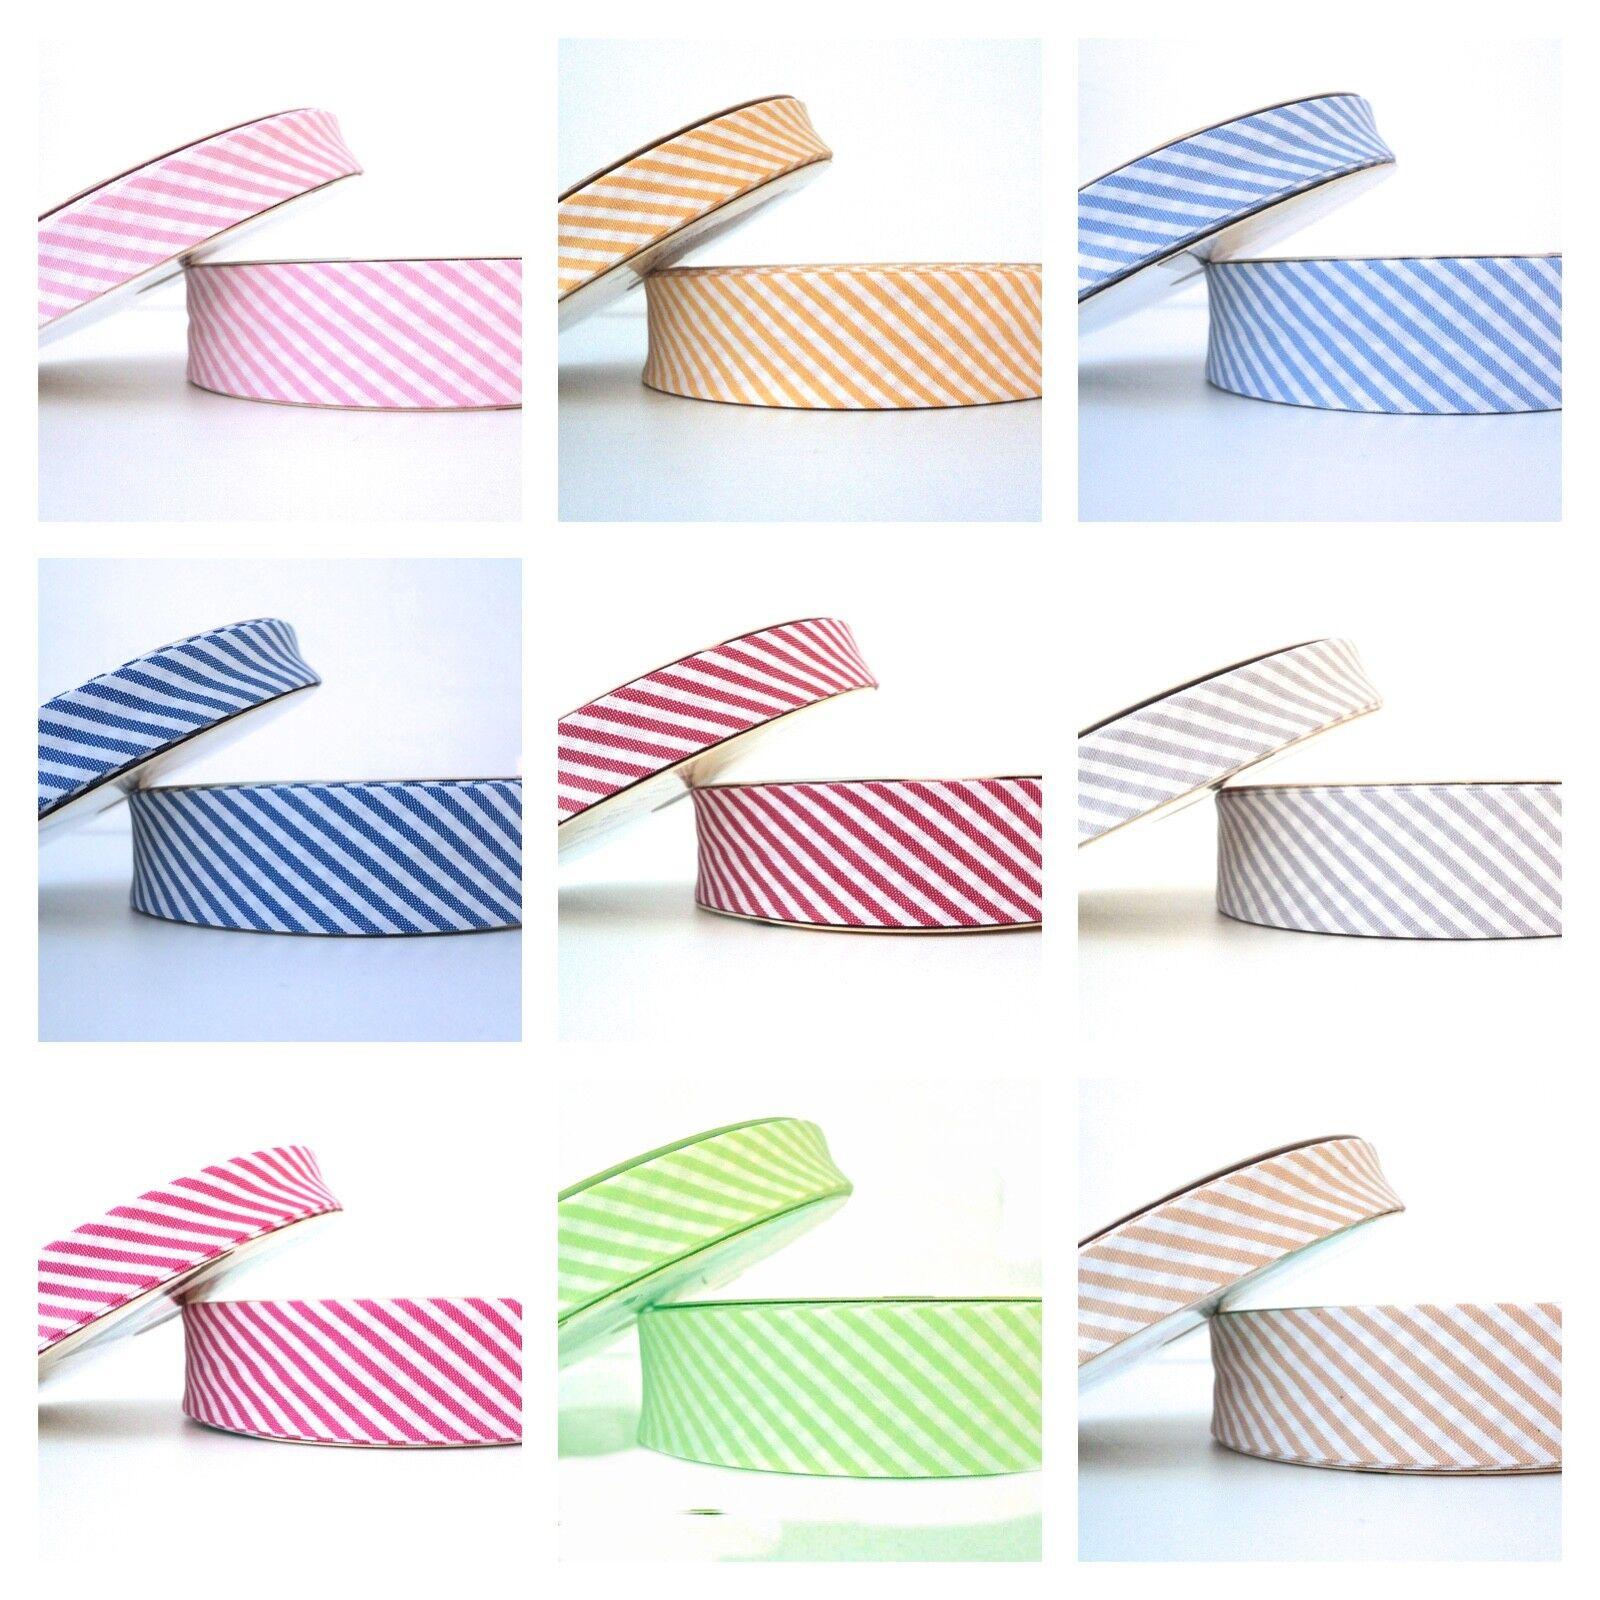 extra wide Stripe Bias Binding Cotton Fabric Folded Trim Higgs /& Higgs Red 30mm